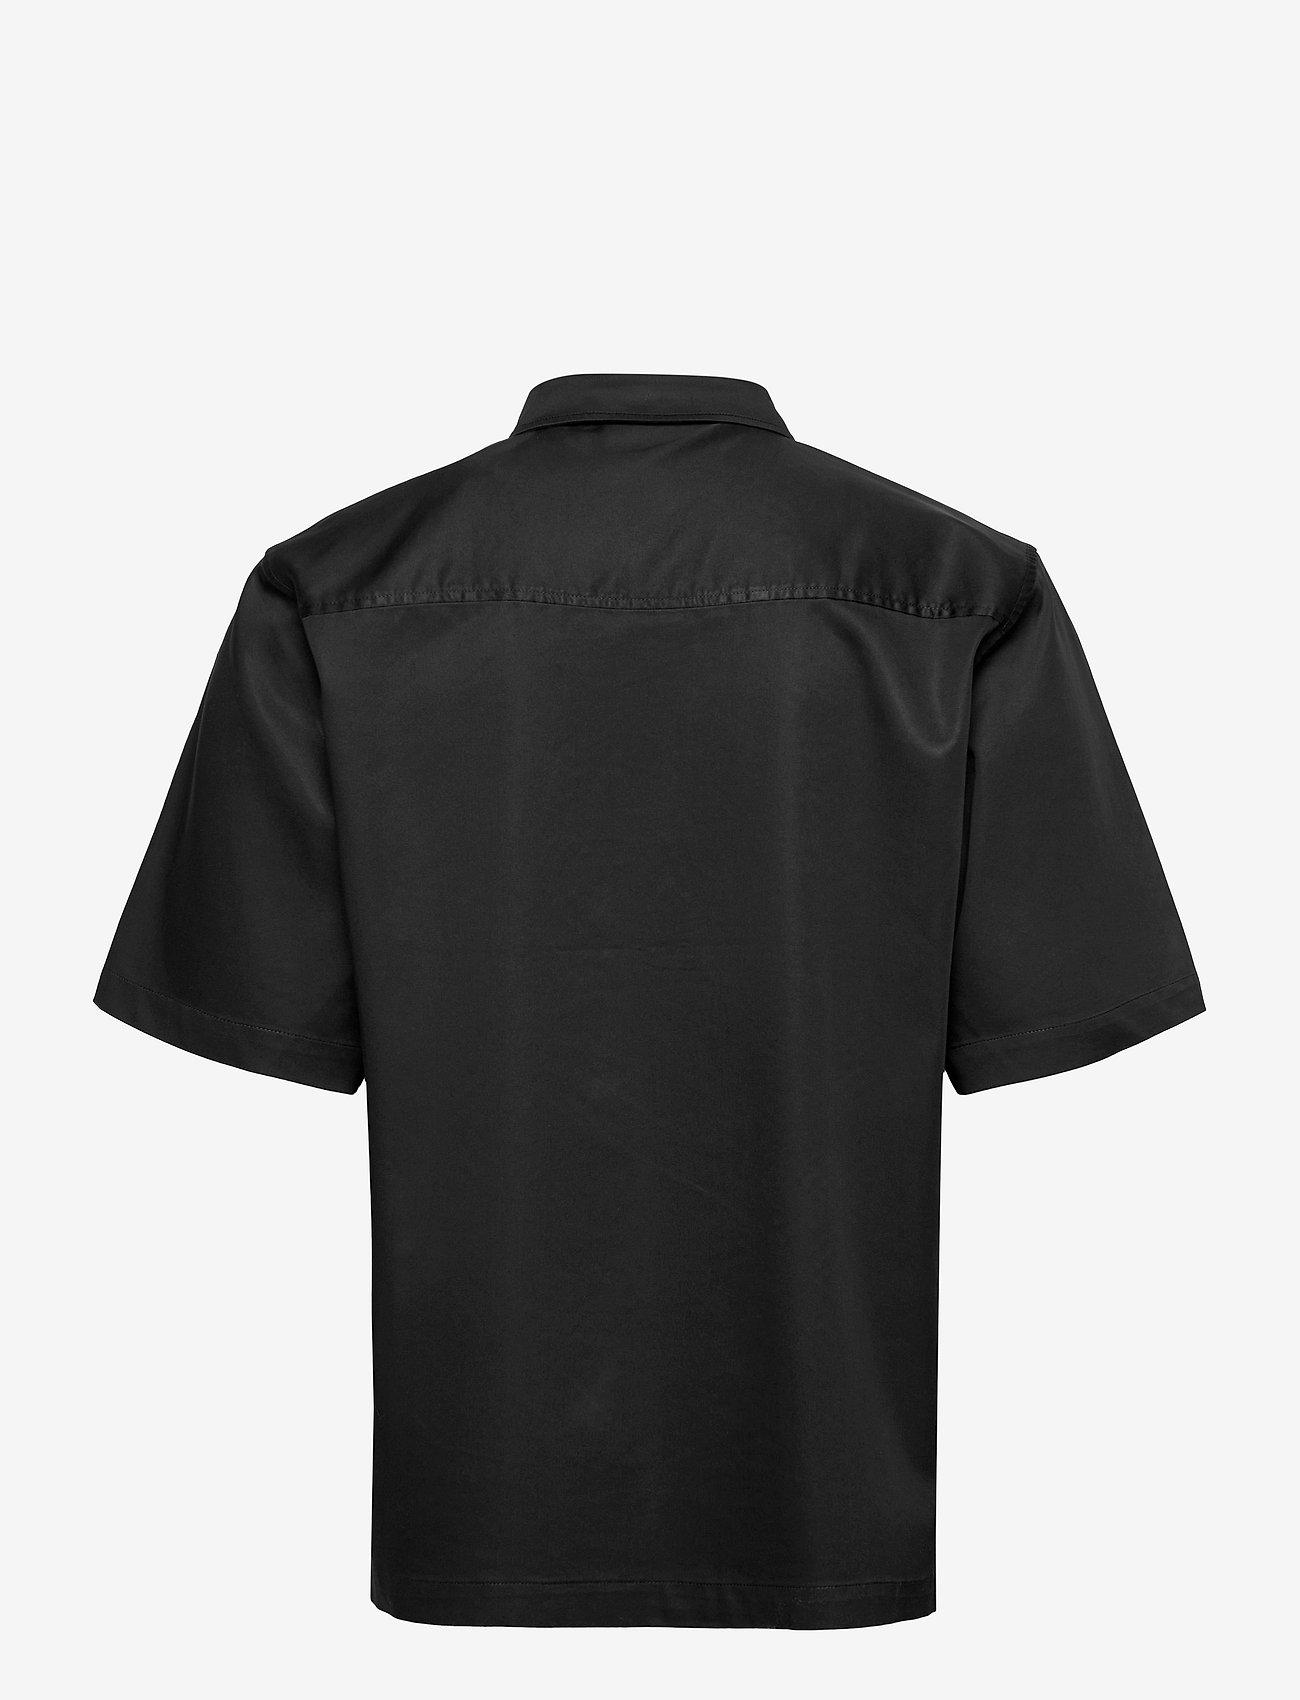 HAN Kjøbenhavn - Boxy Shirt SS - oxford overhemden - black - 2